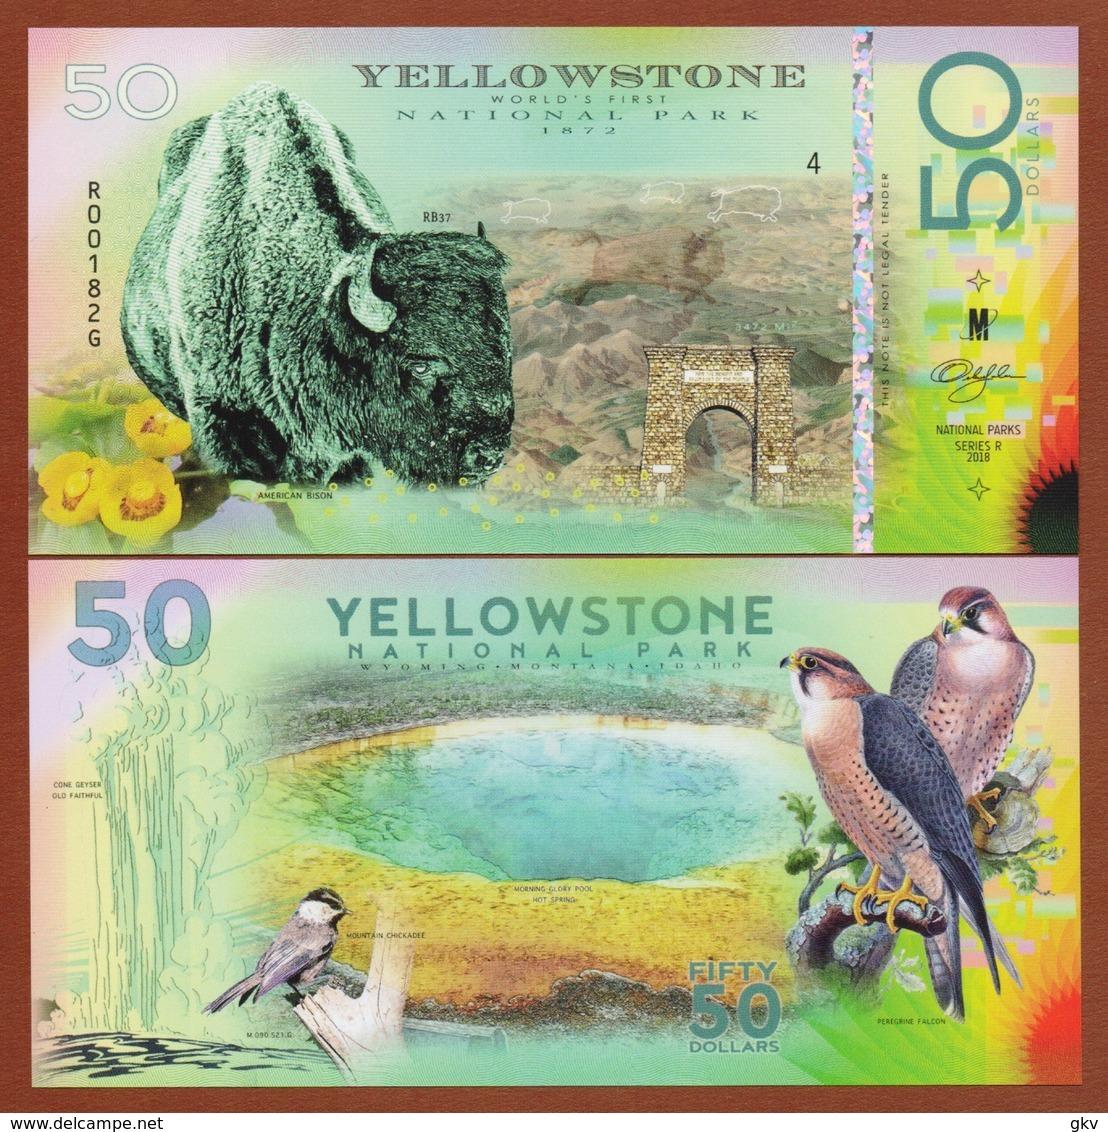 YELLOWSTONE National Park (USA) 50 Dollars 2018 Polymer UNC - Bankbiljetten